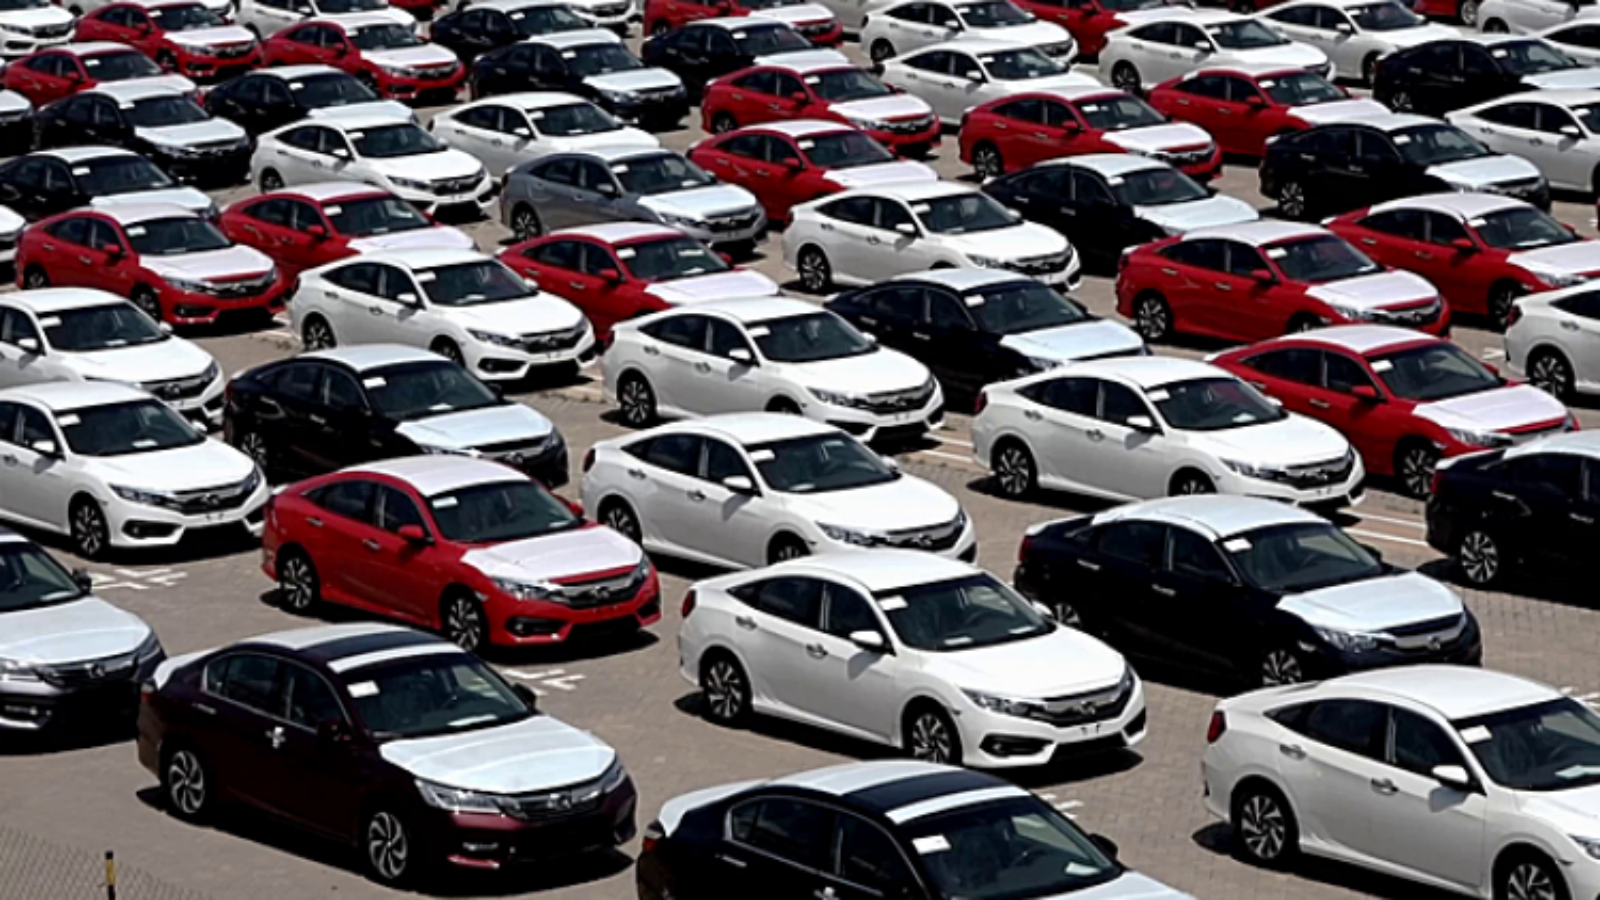 Car imports plummet nearly 50%, COVID-19 blamed